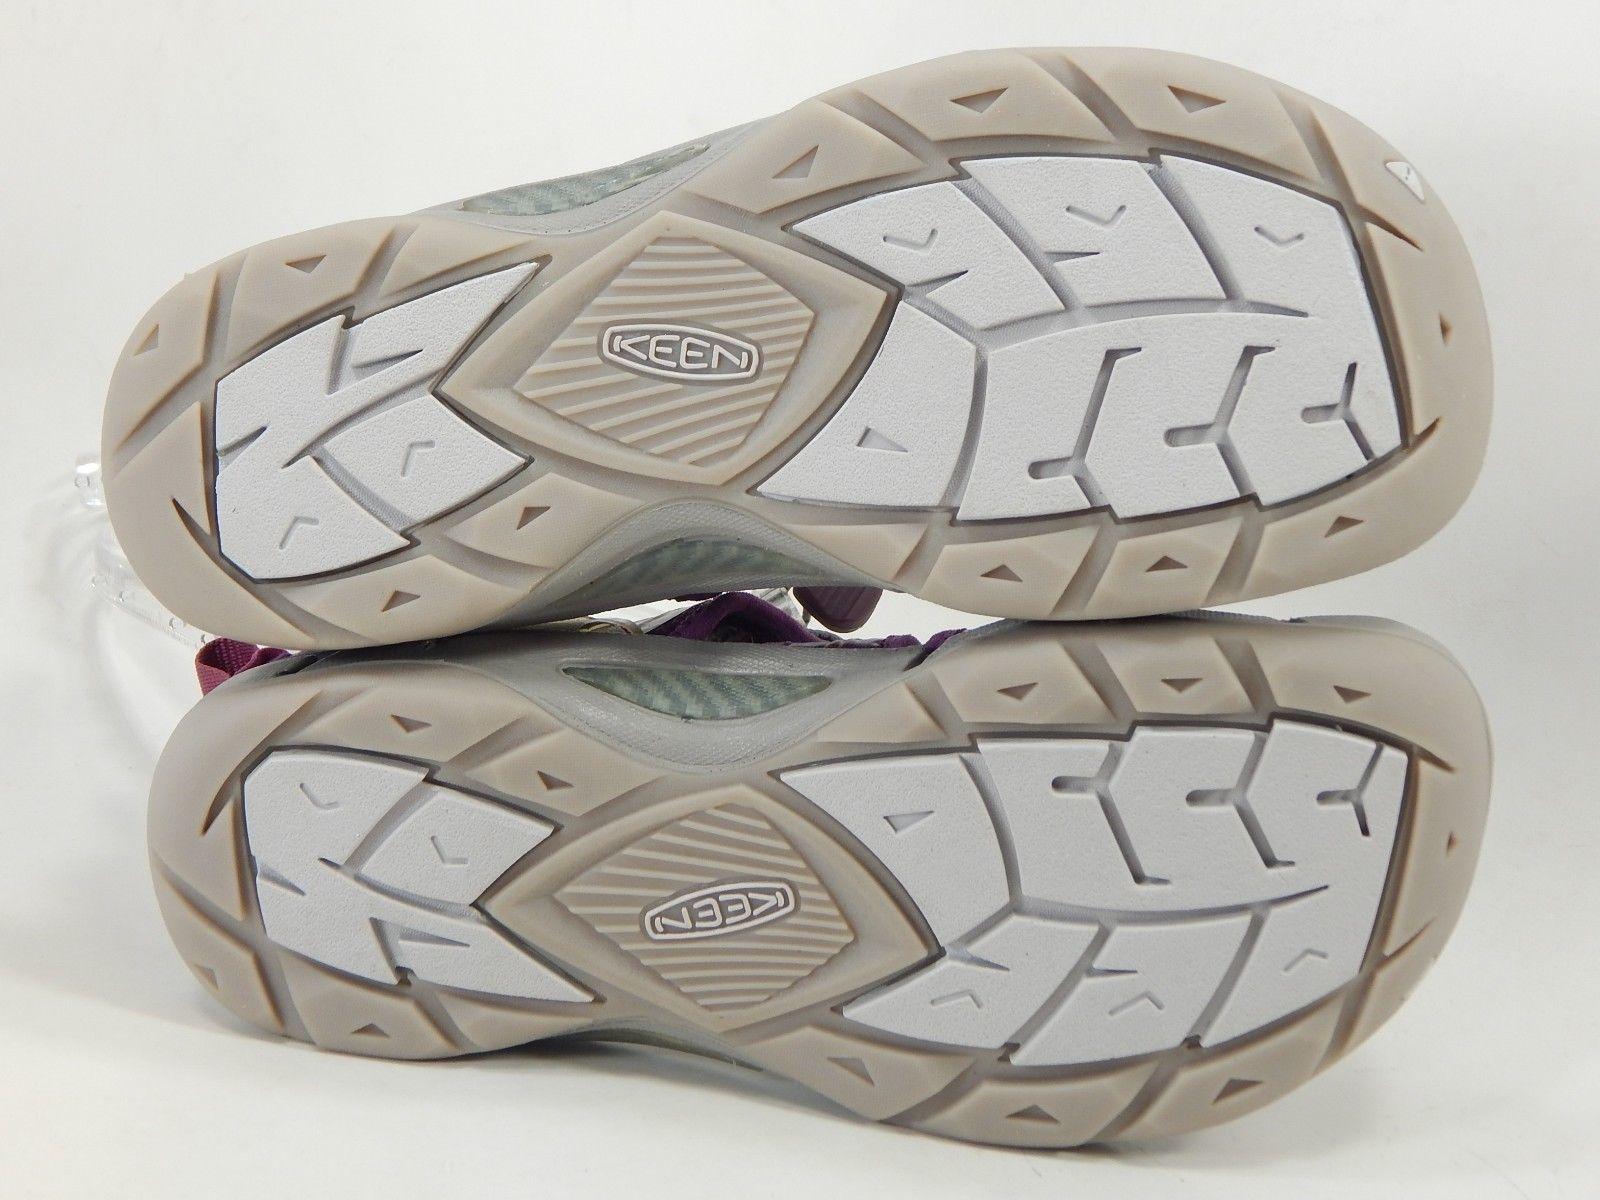 Keen Evofit One Size 7 M EU 37.5 Women's Sports Sandals Grape Kiss / Grape Wine